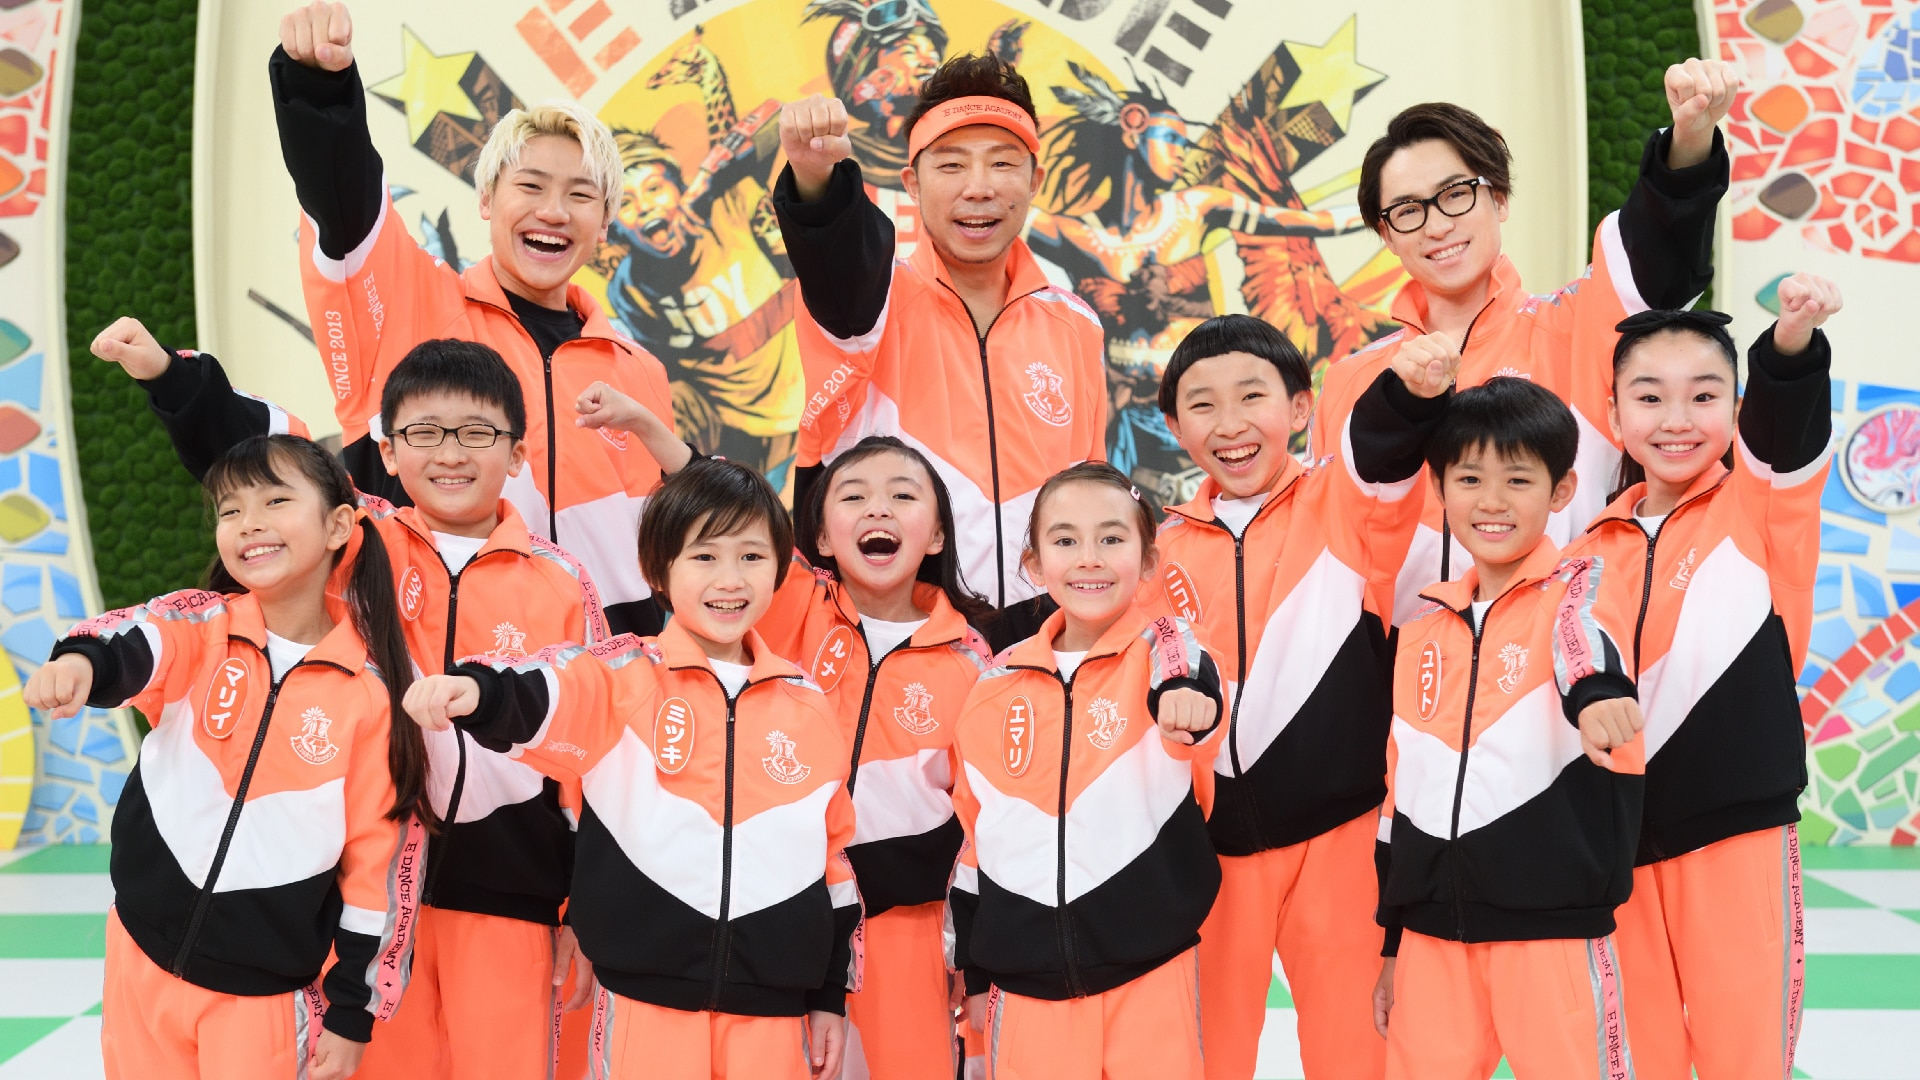 Eダンスアカデミー めちゃくちゃダンスコンテスト開催中